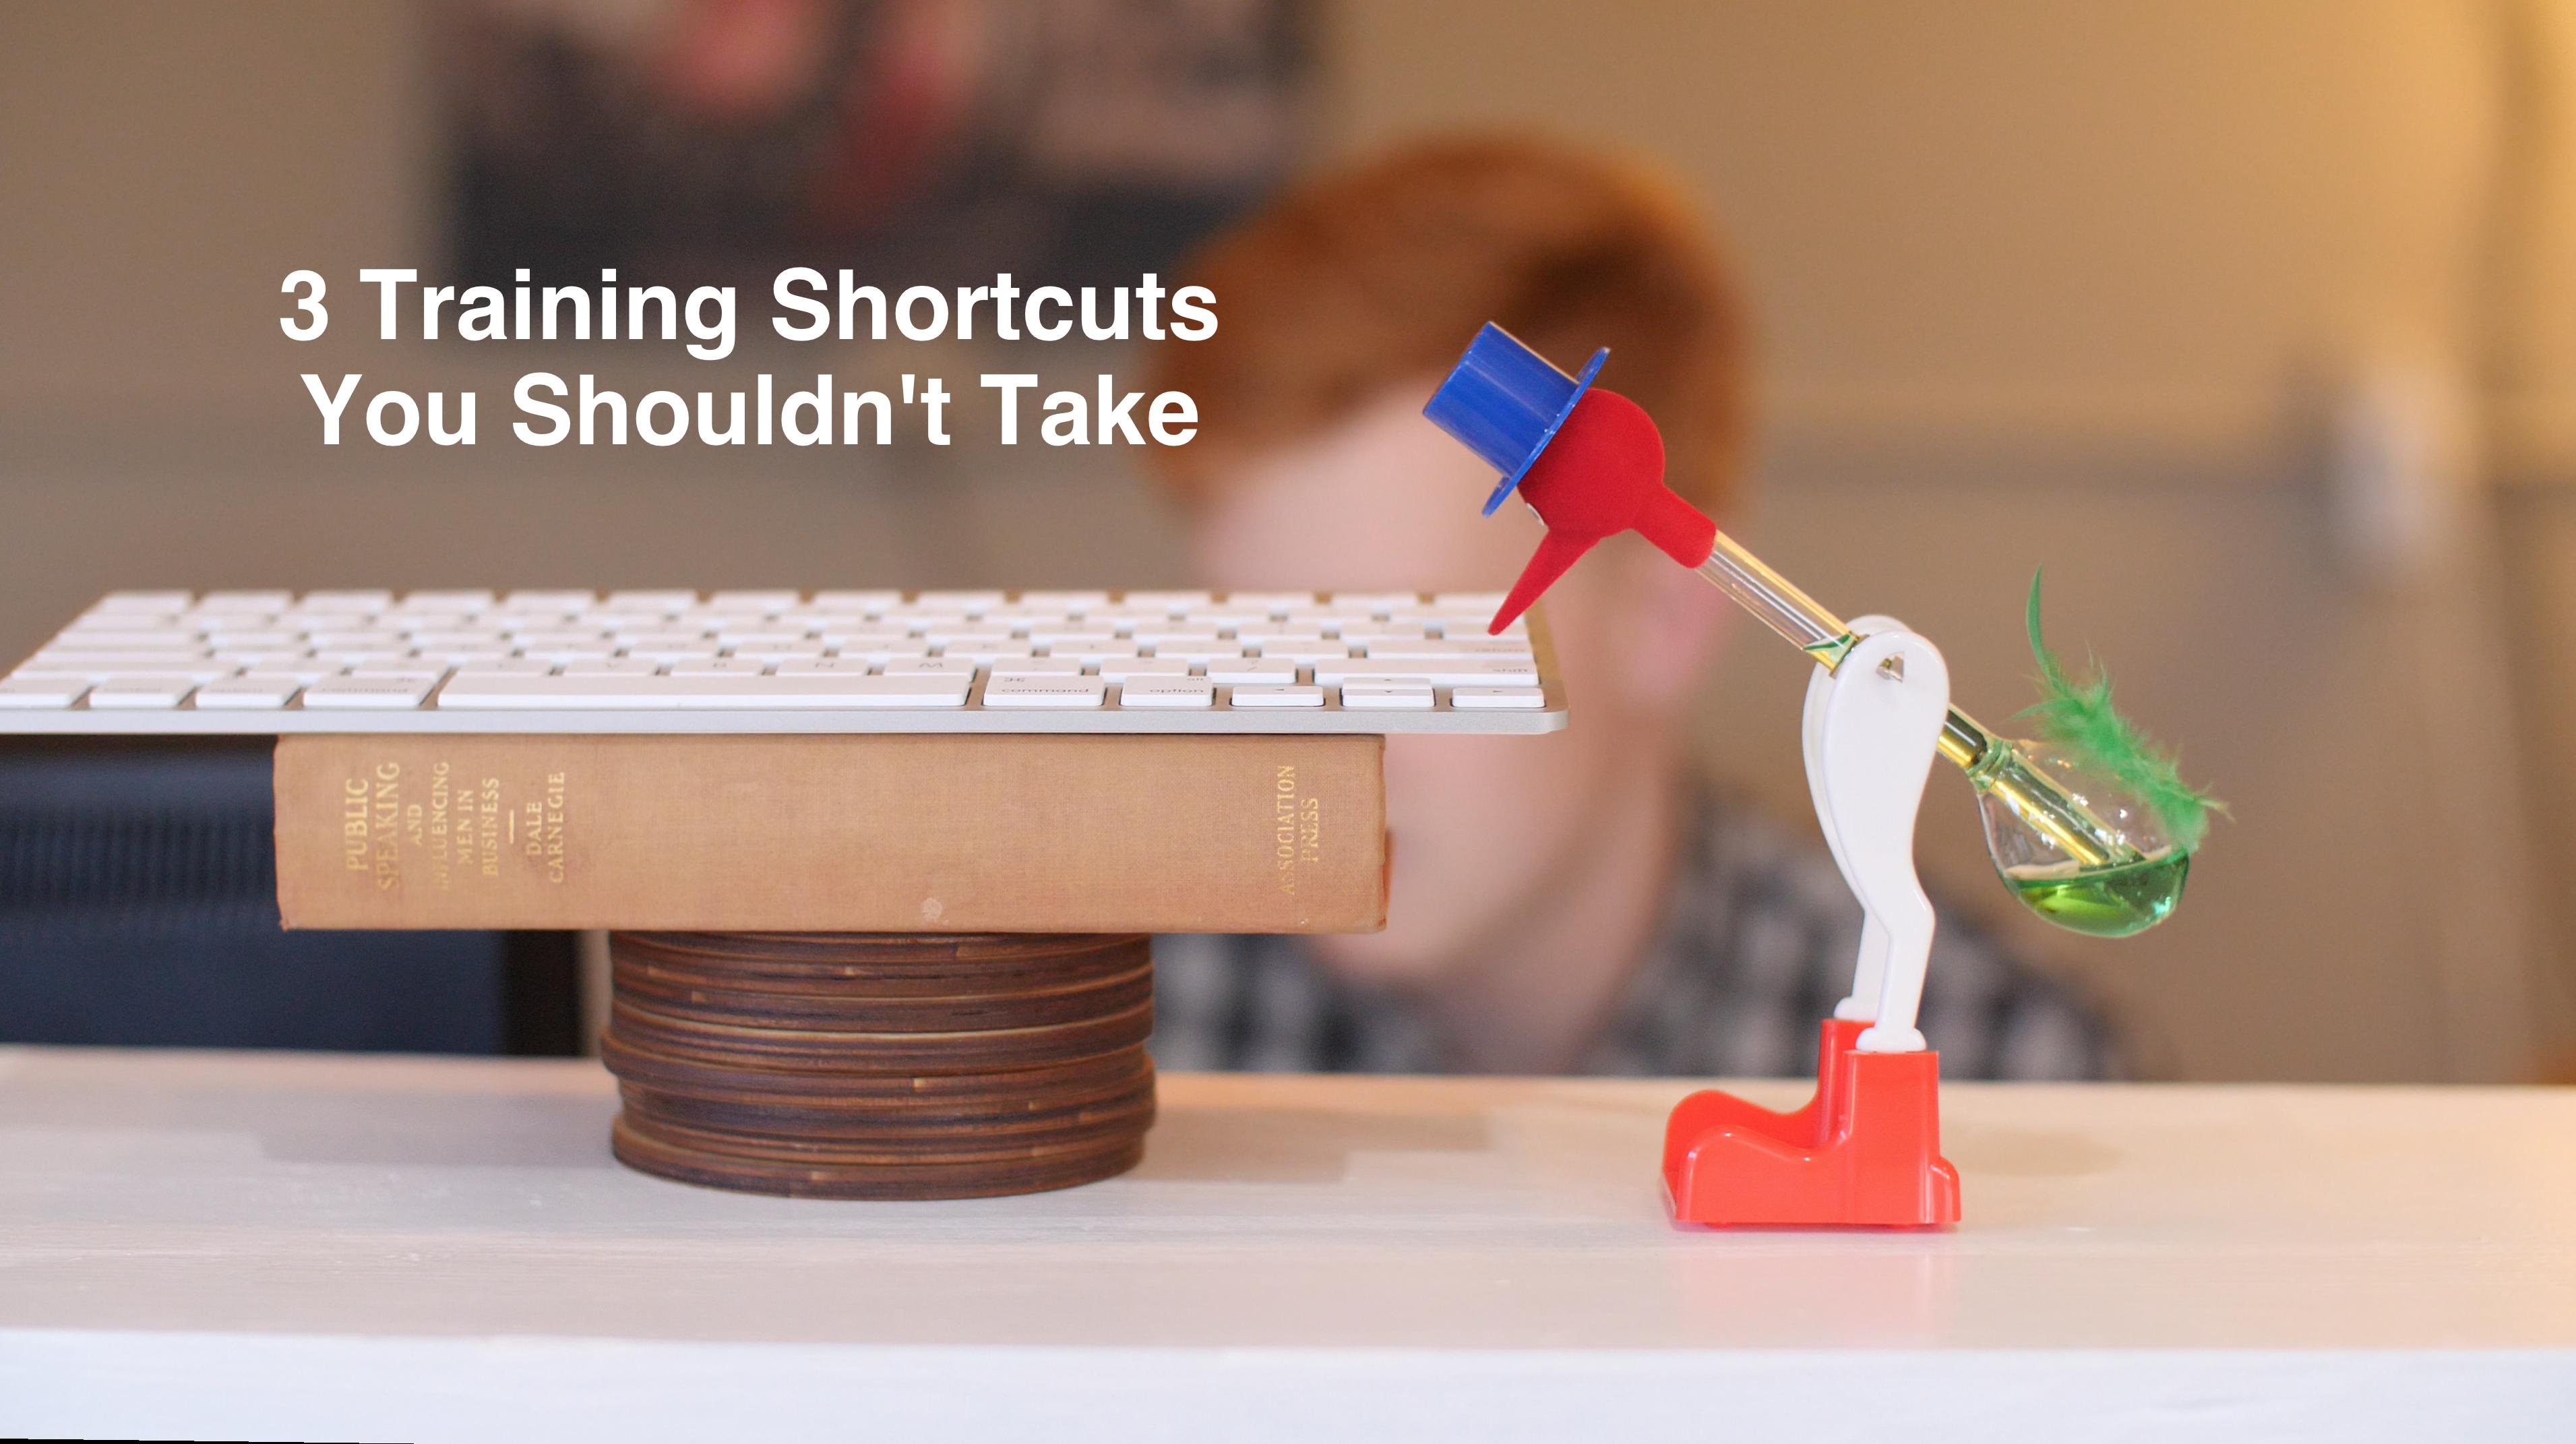 3 Training Shortcuts You Shouldn't Take [VIDEO]